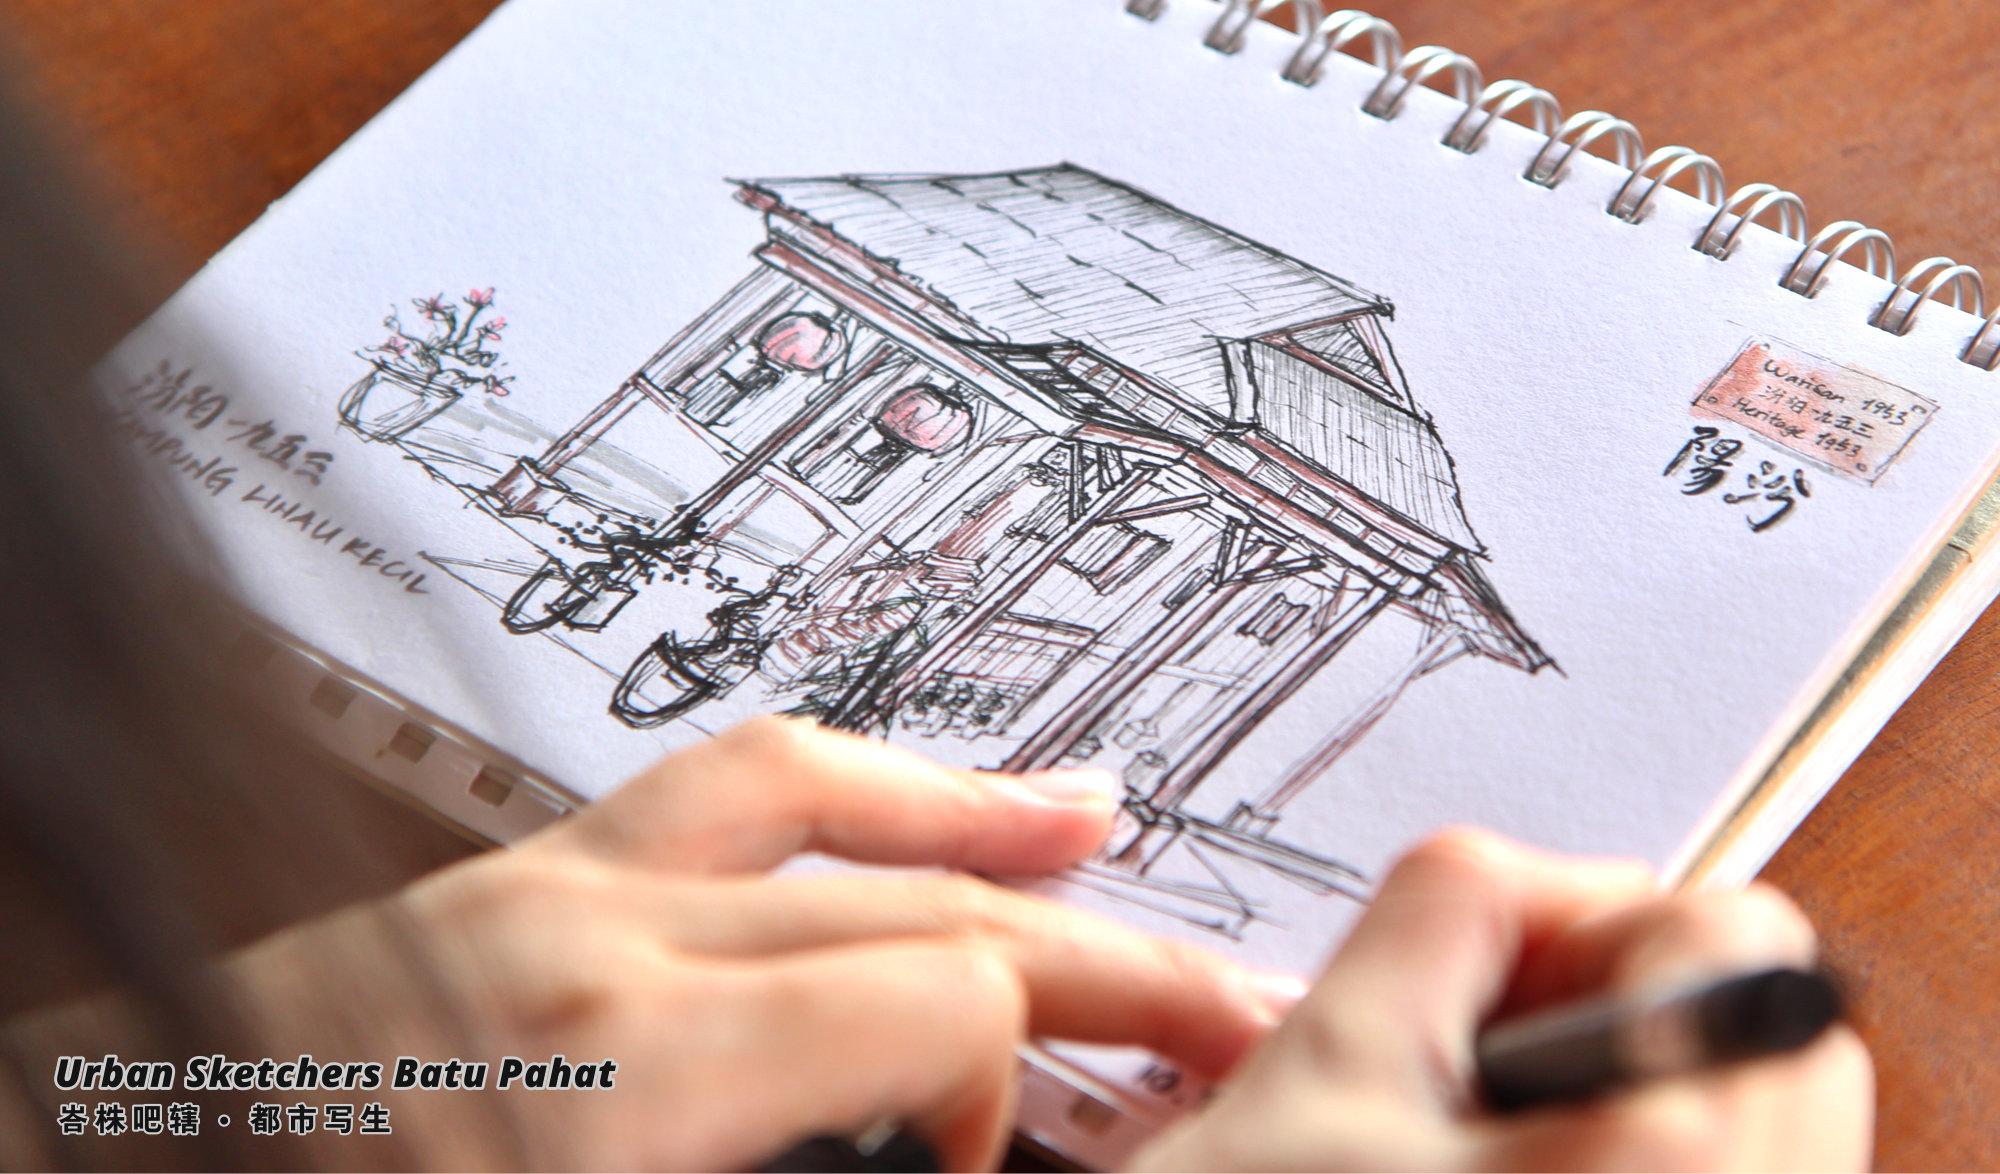 Urban Sketchers Batu Pahat Johor Malaysia Art Drawing Sketching 马来西亚 柔佛 峇株吧辖都市写生 艺术 画画 A016